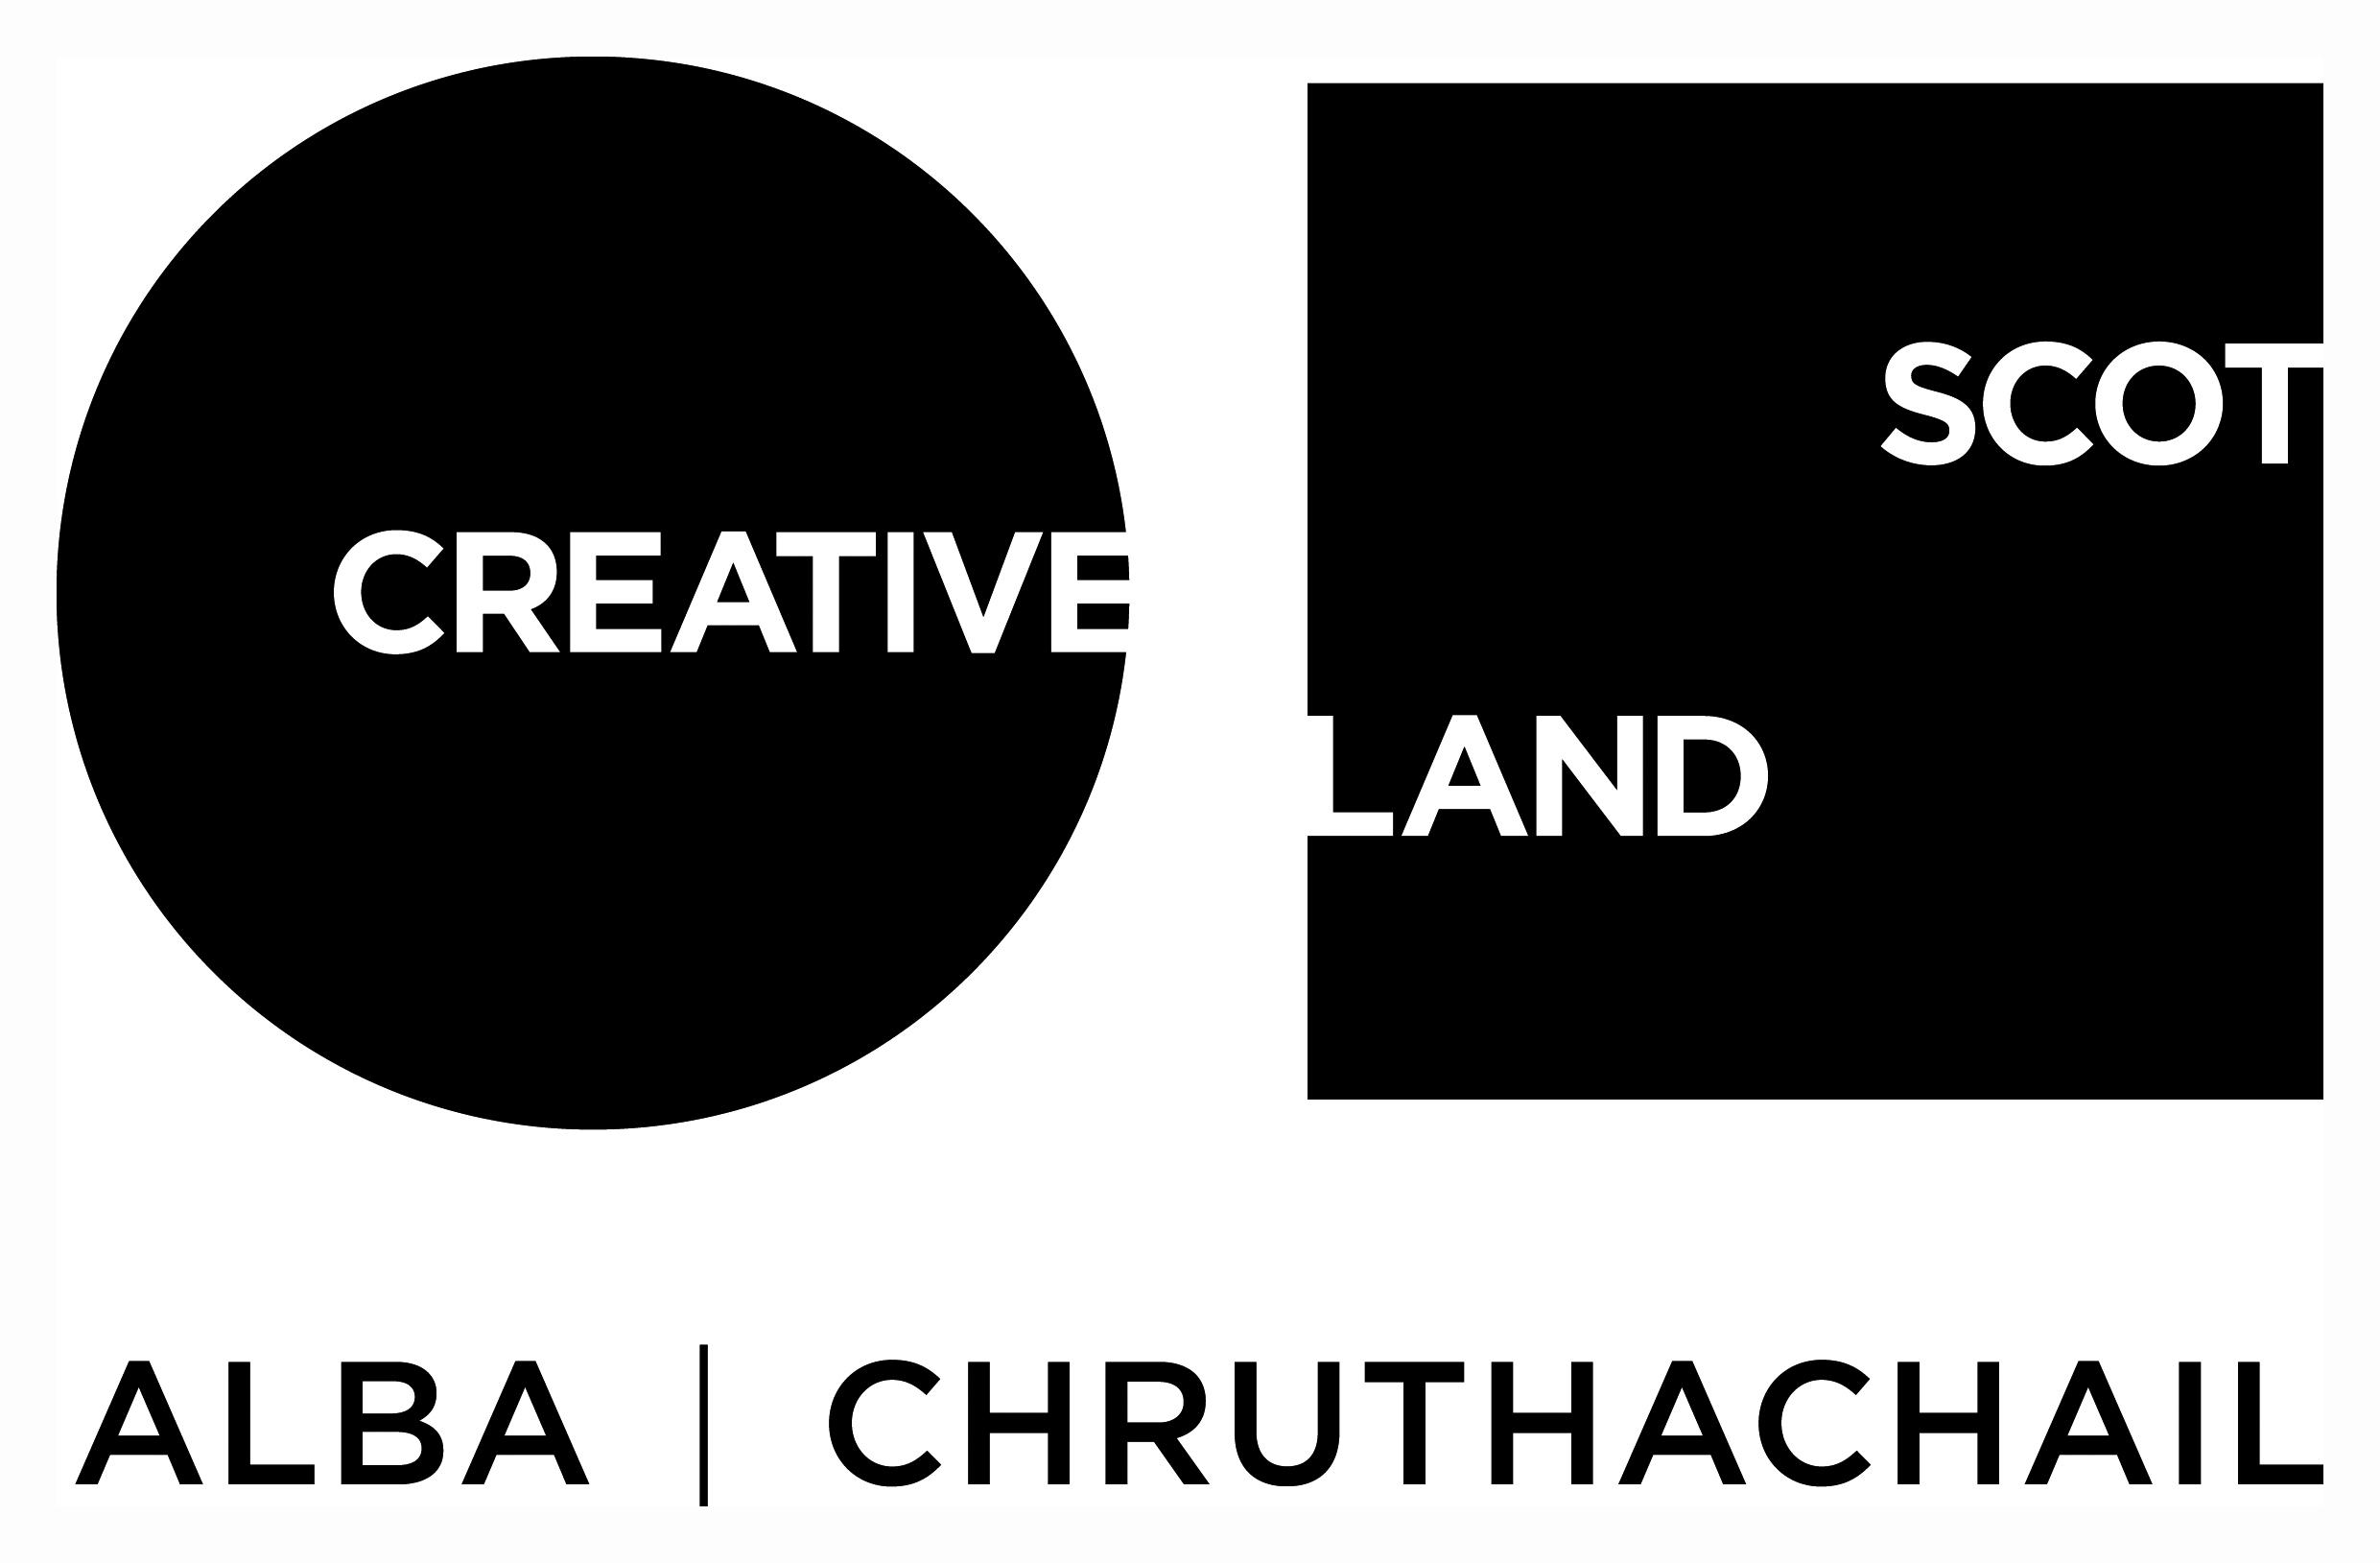 Creative_Scotland_bw.jpg